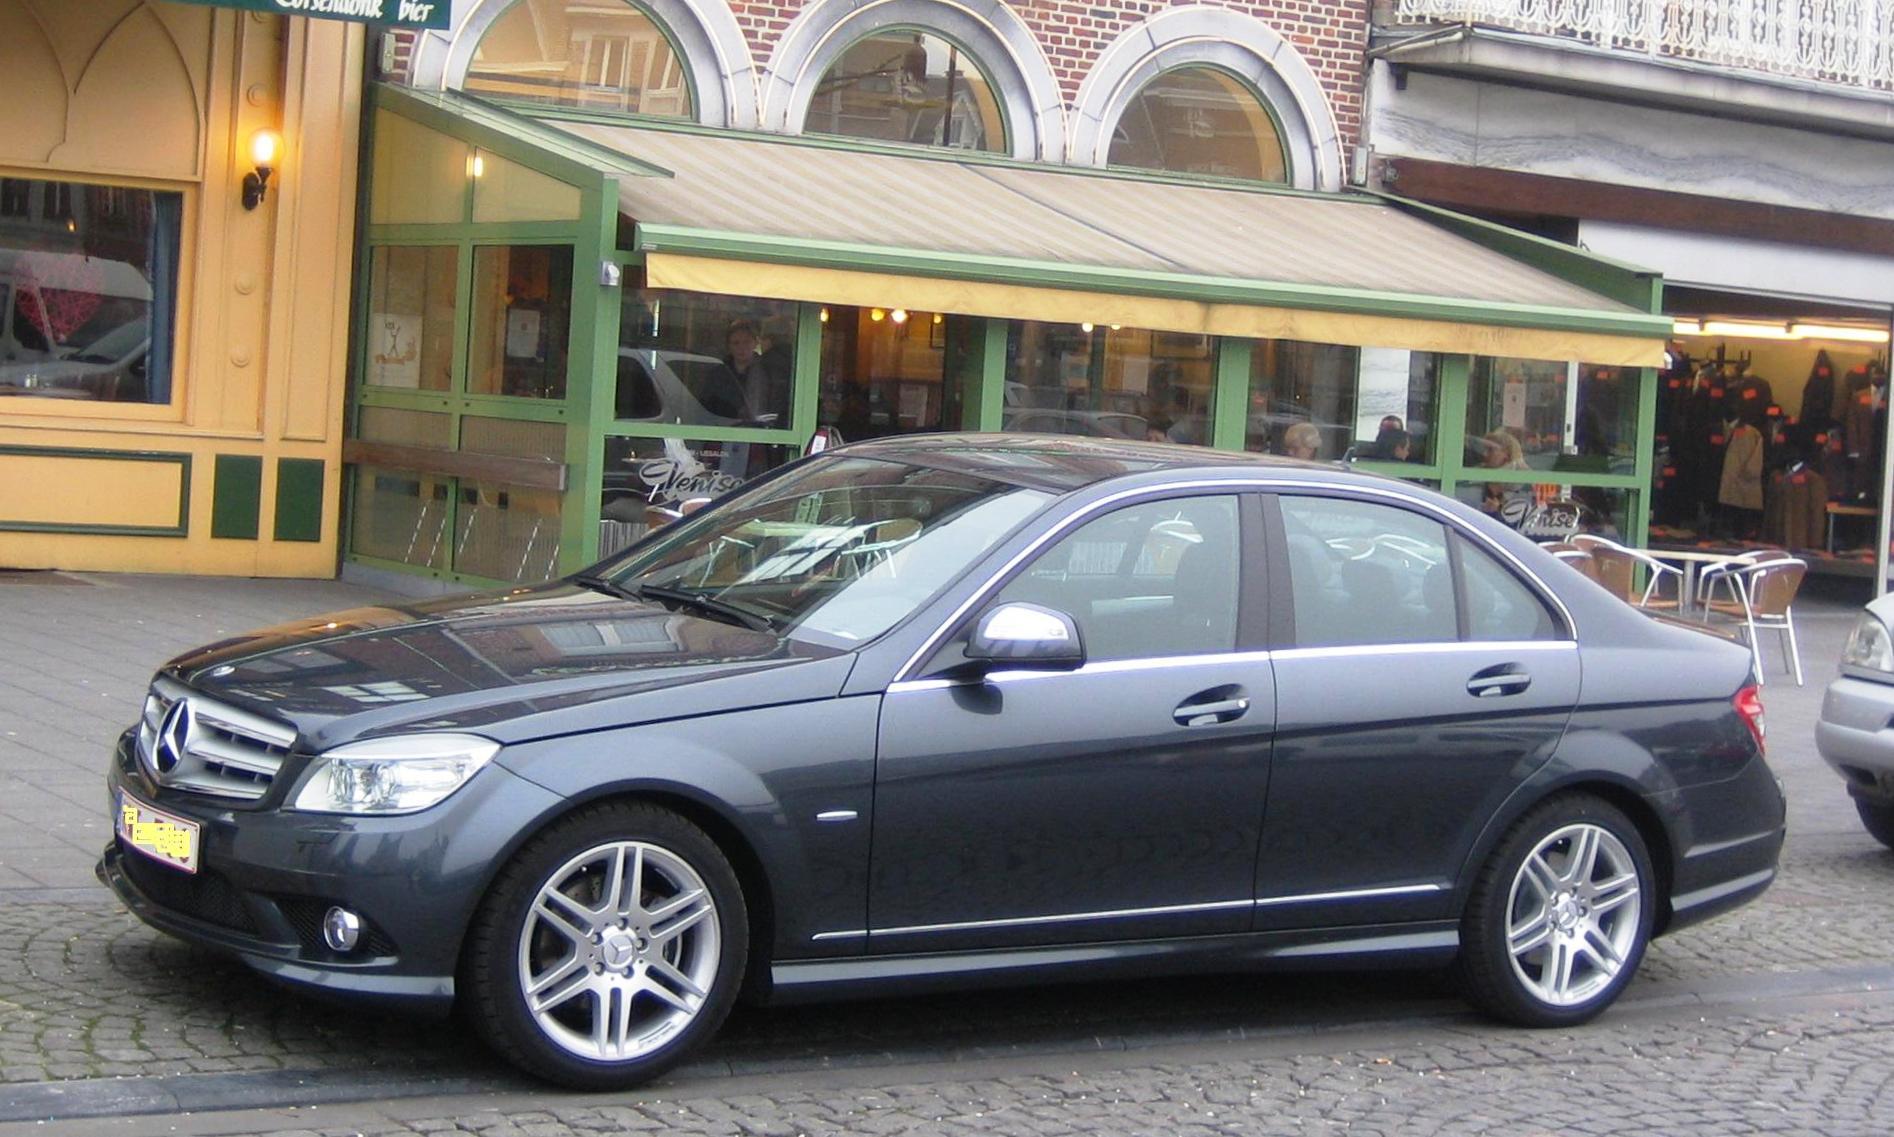 Bestand mercedes benz w204 amg sint truiden feb 2008 jpg for Mercedes benz w204